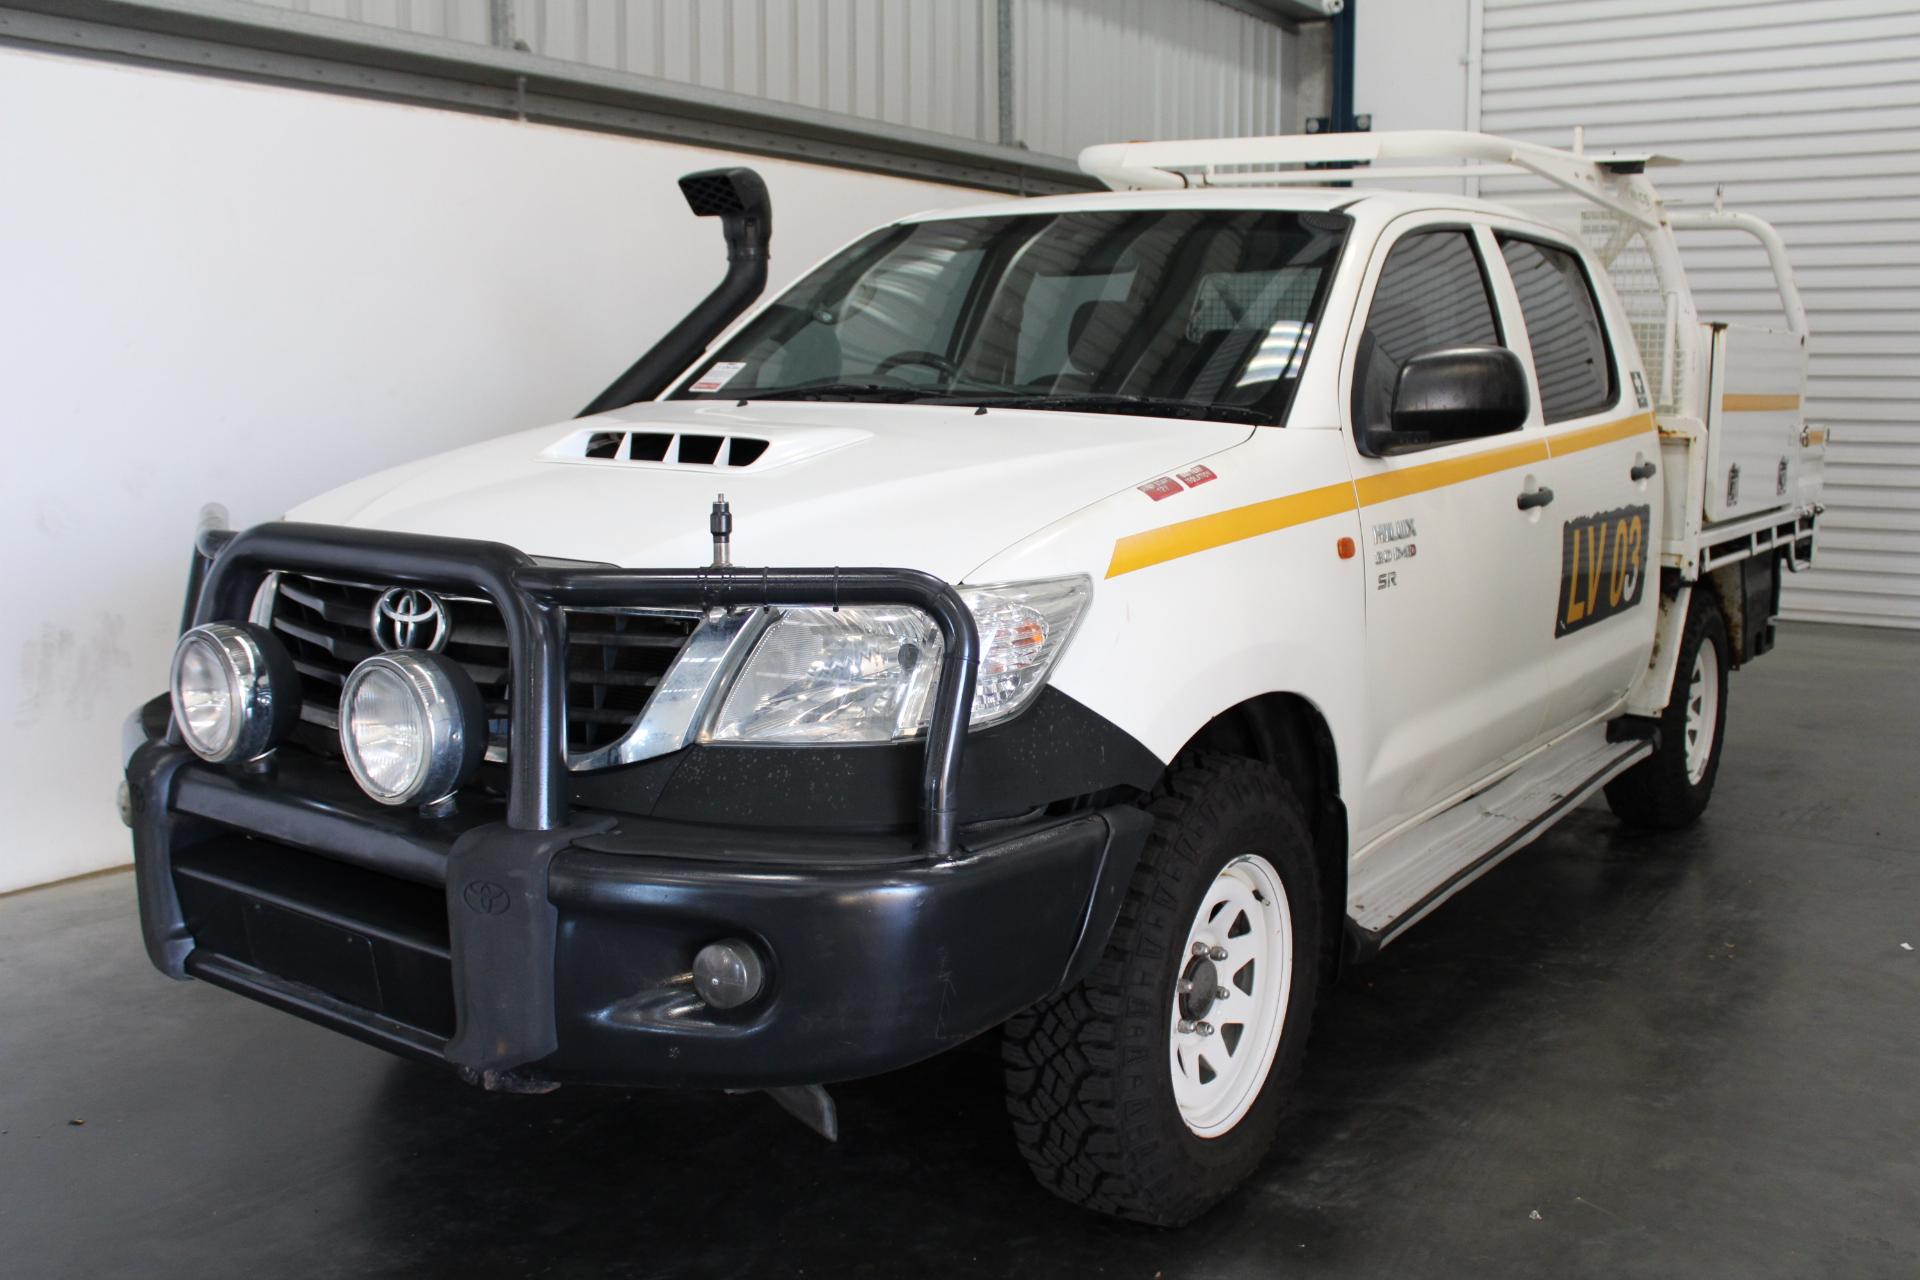 2013 Toyota Hilux SR (4x4) KUN26R Turbo Diesel Dual Cab Chassis 70,498km